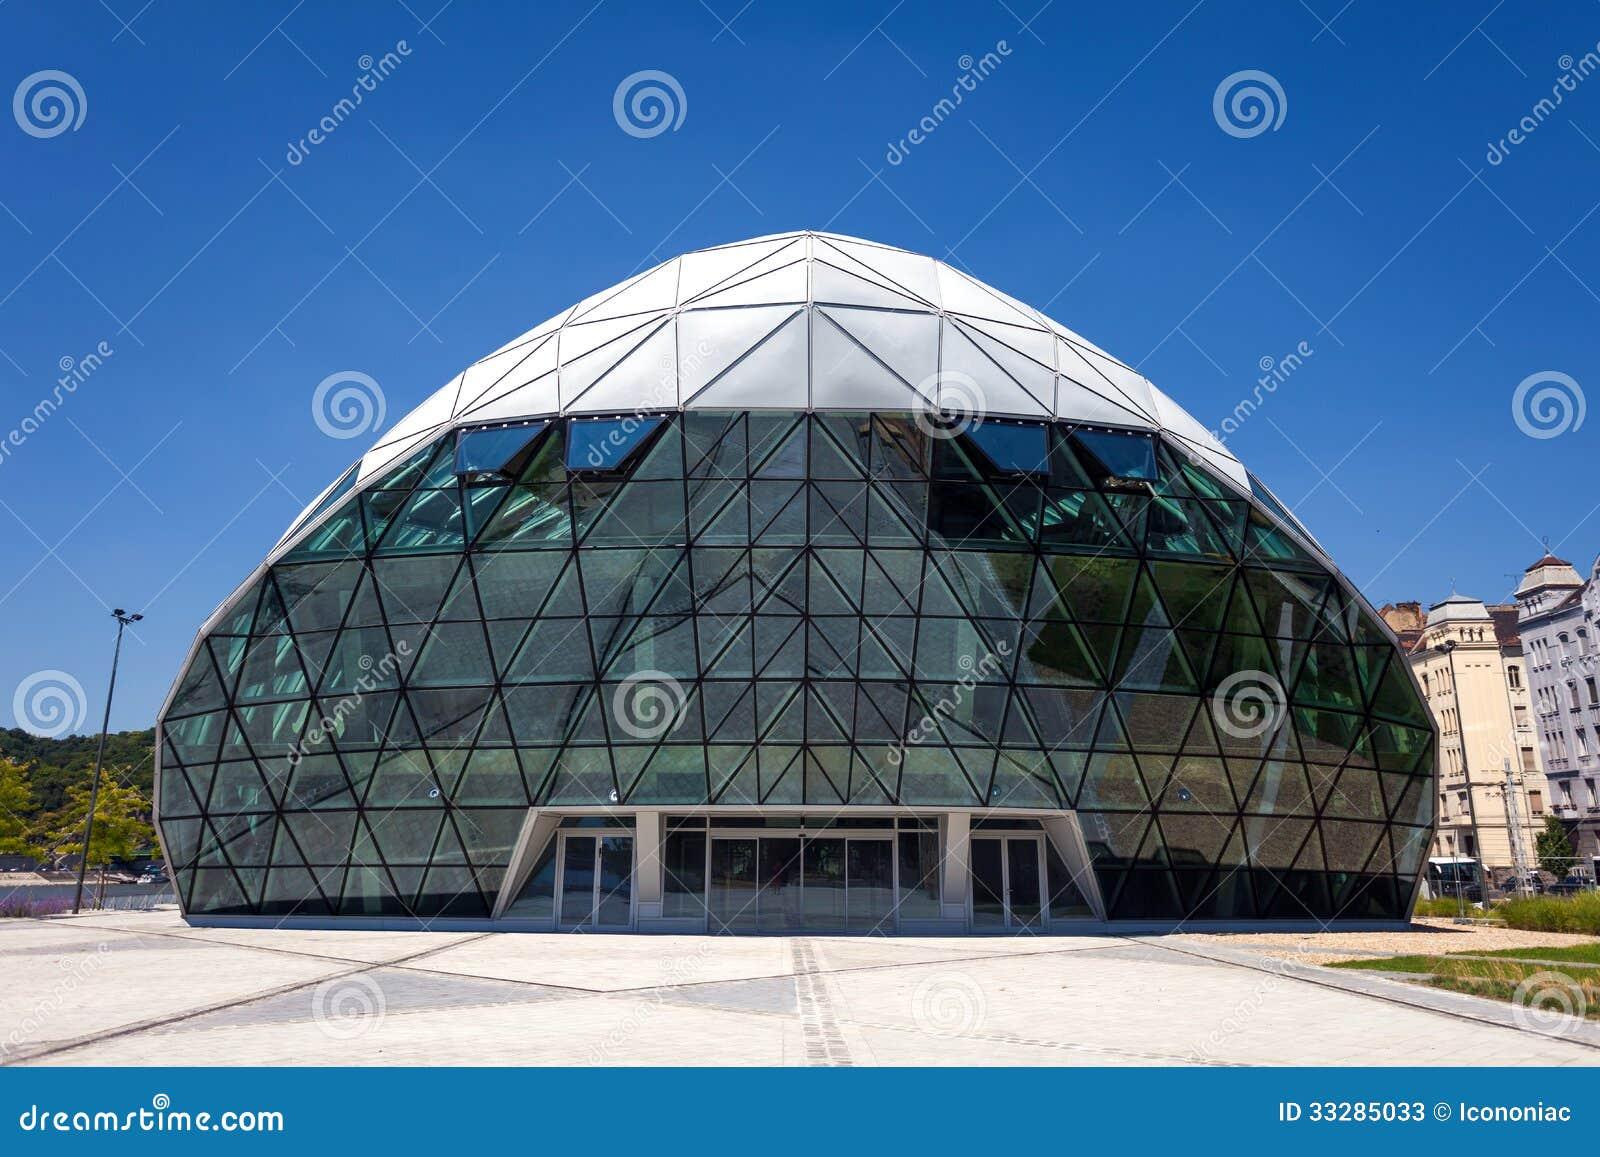 cet budapest modern whale shaped building on the bank of danube stock image image 33285033. Black Bedroom Furniture Sets. Home Design Ideas